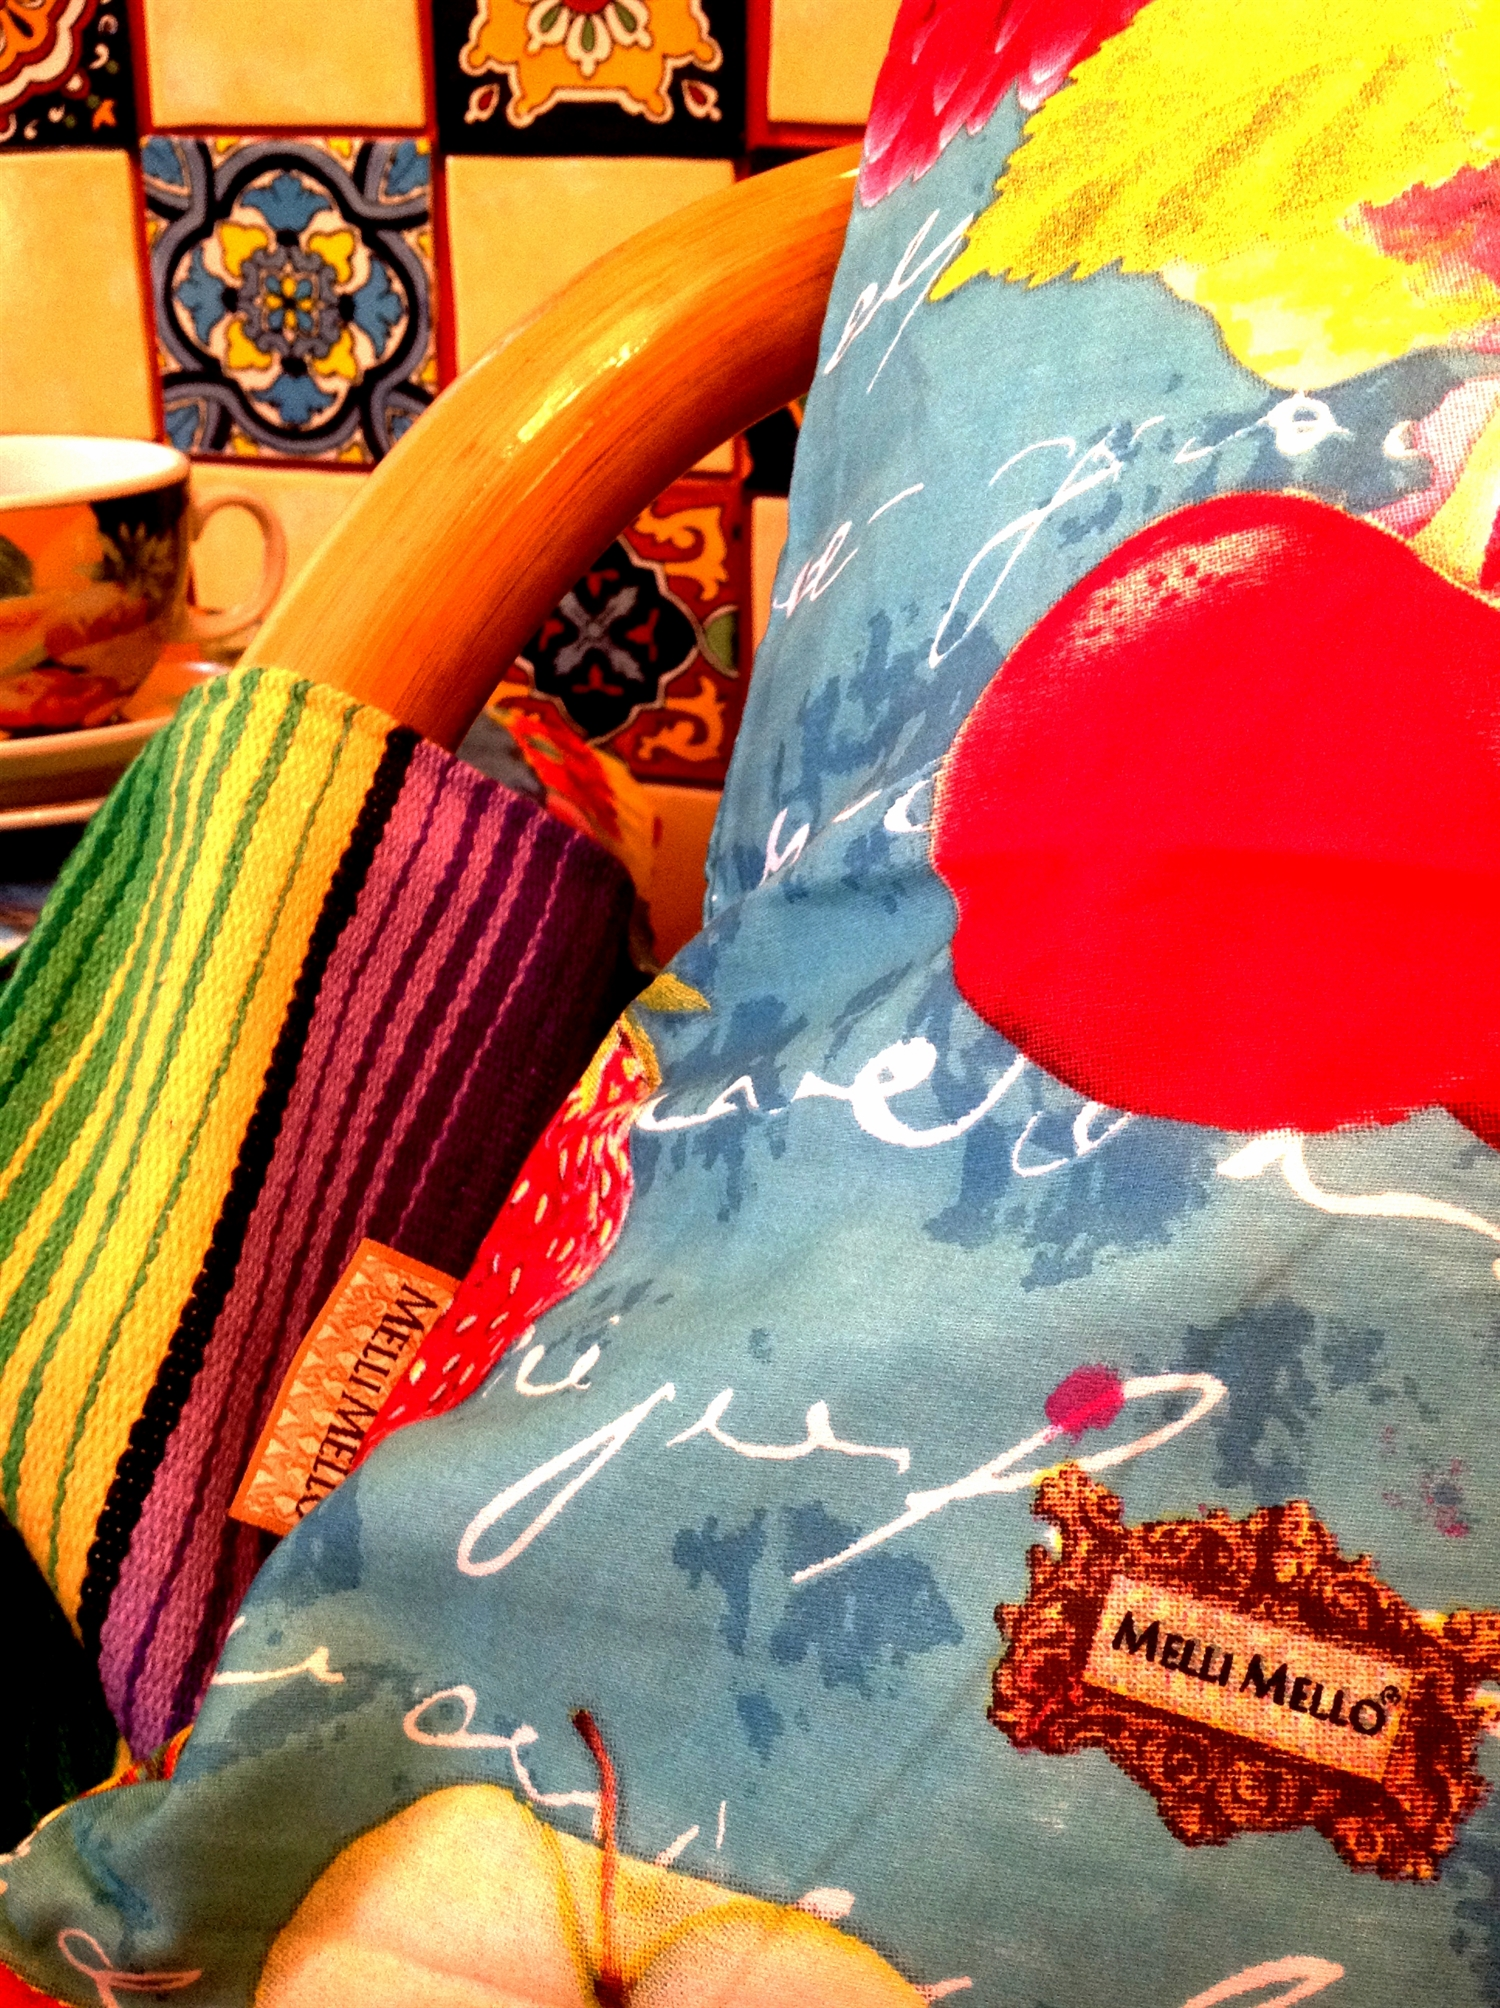 3 melli mello styl meksykanski wnetrze boho kolorowe kafelki meksykanskie plytki projektowanie wnetrz interior design mexican style santa fe home colorful tiles serape